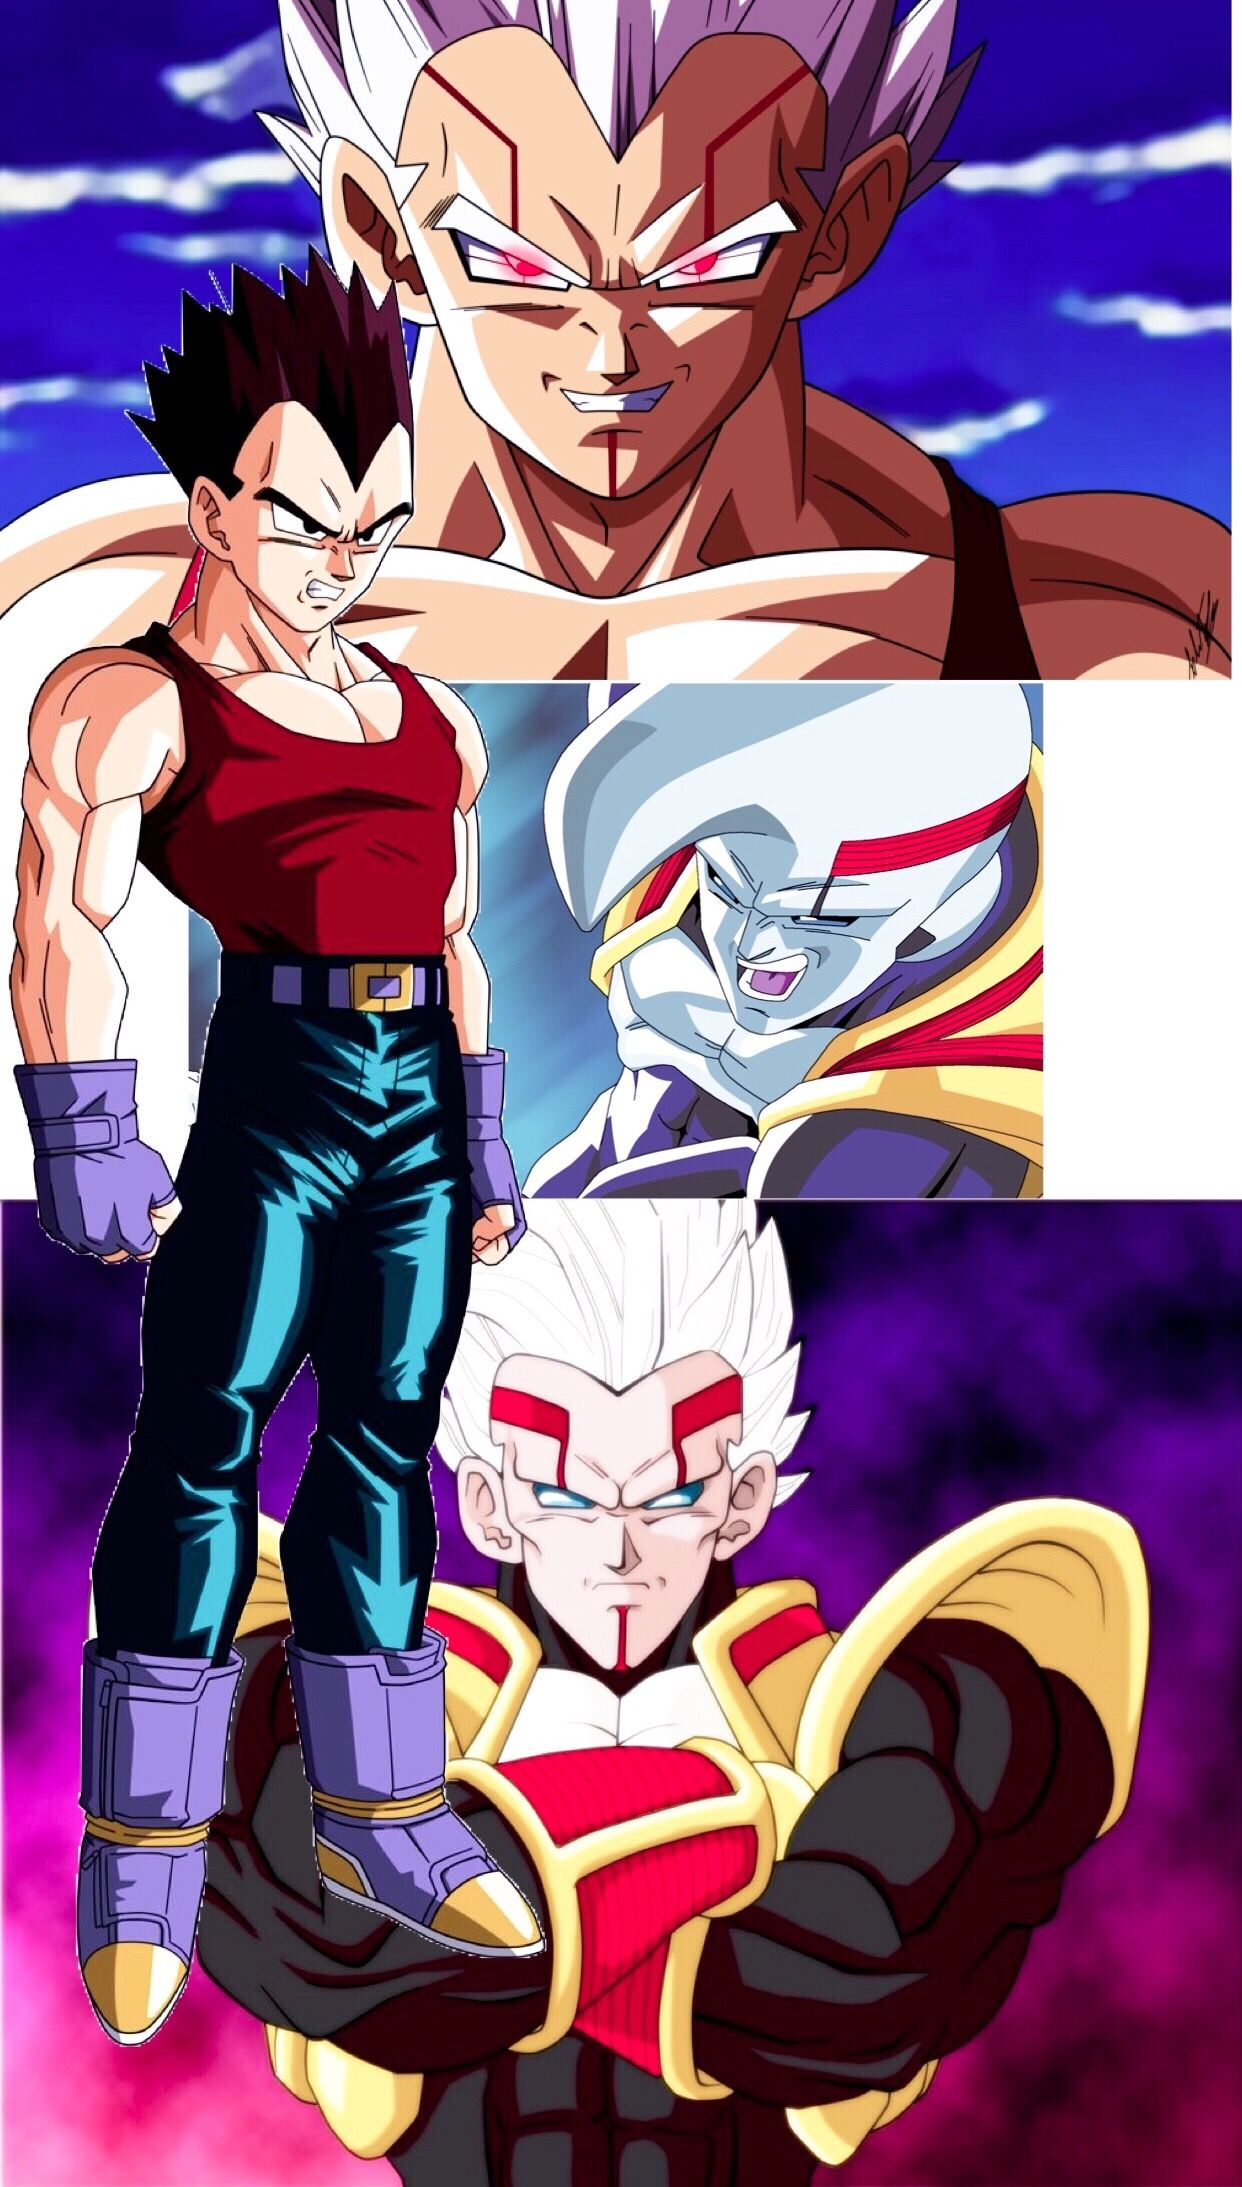 Vegeta Baby Super Saiyan Super Saiyan 2 Original Anime Drago